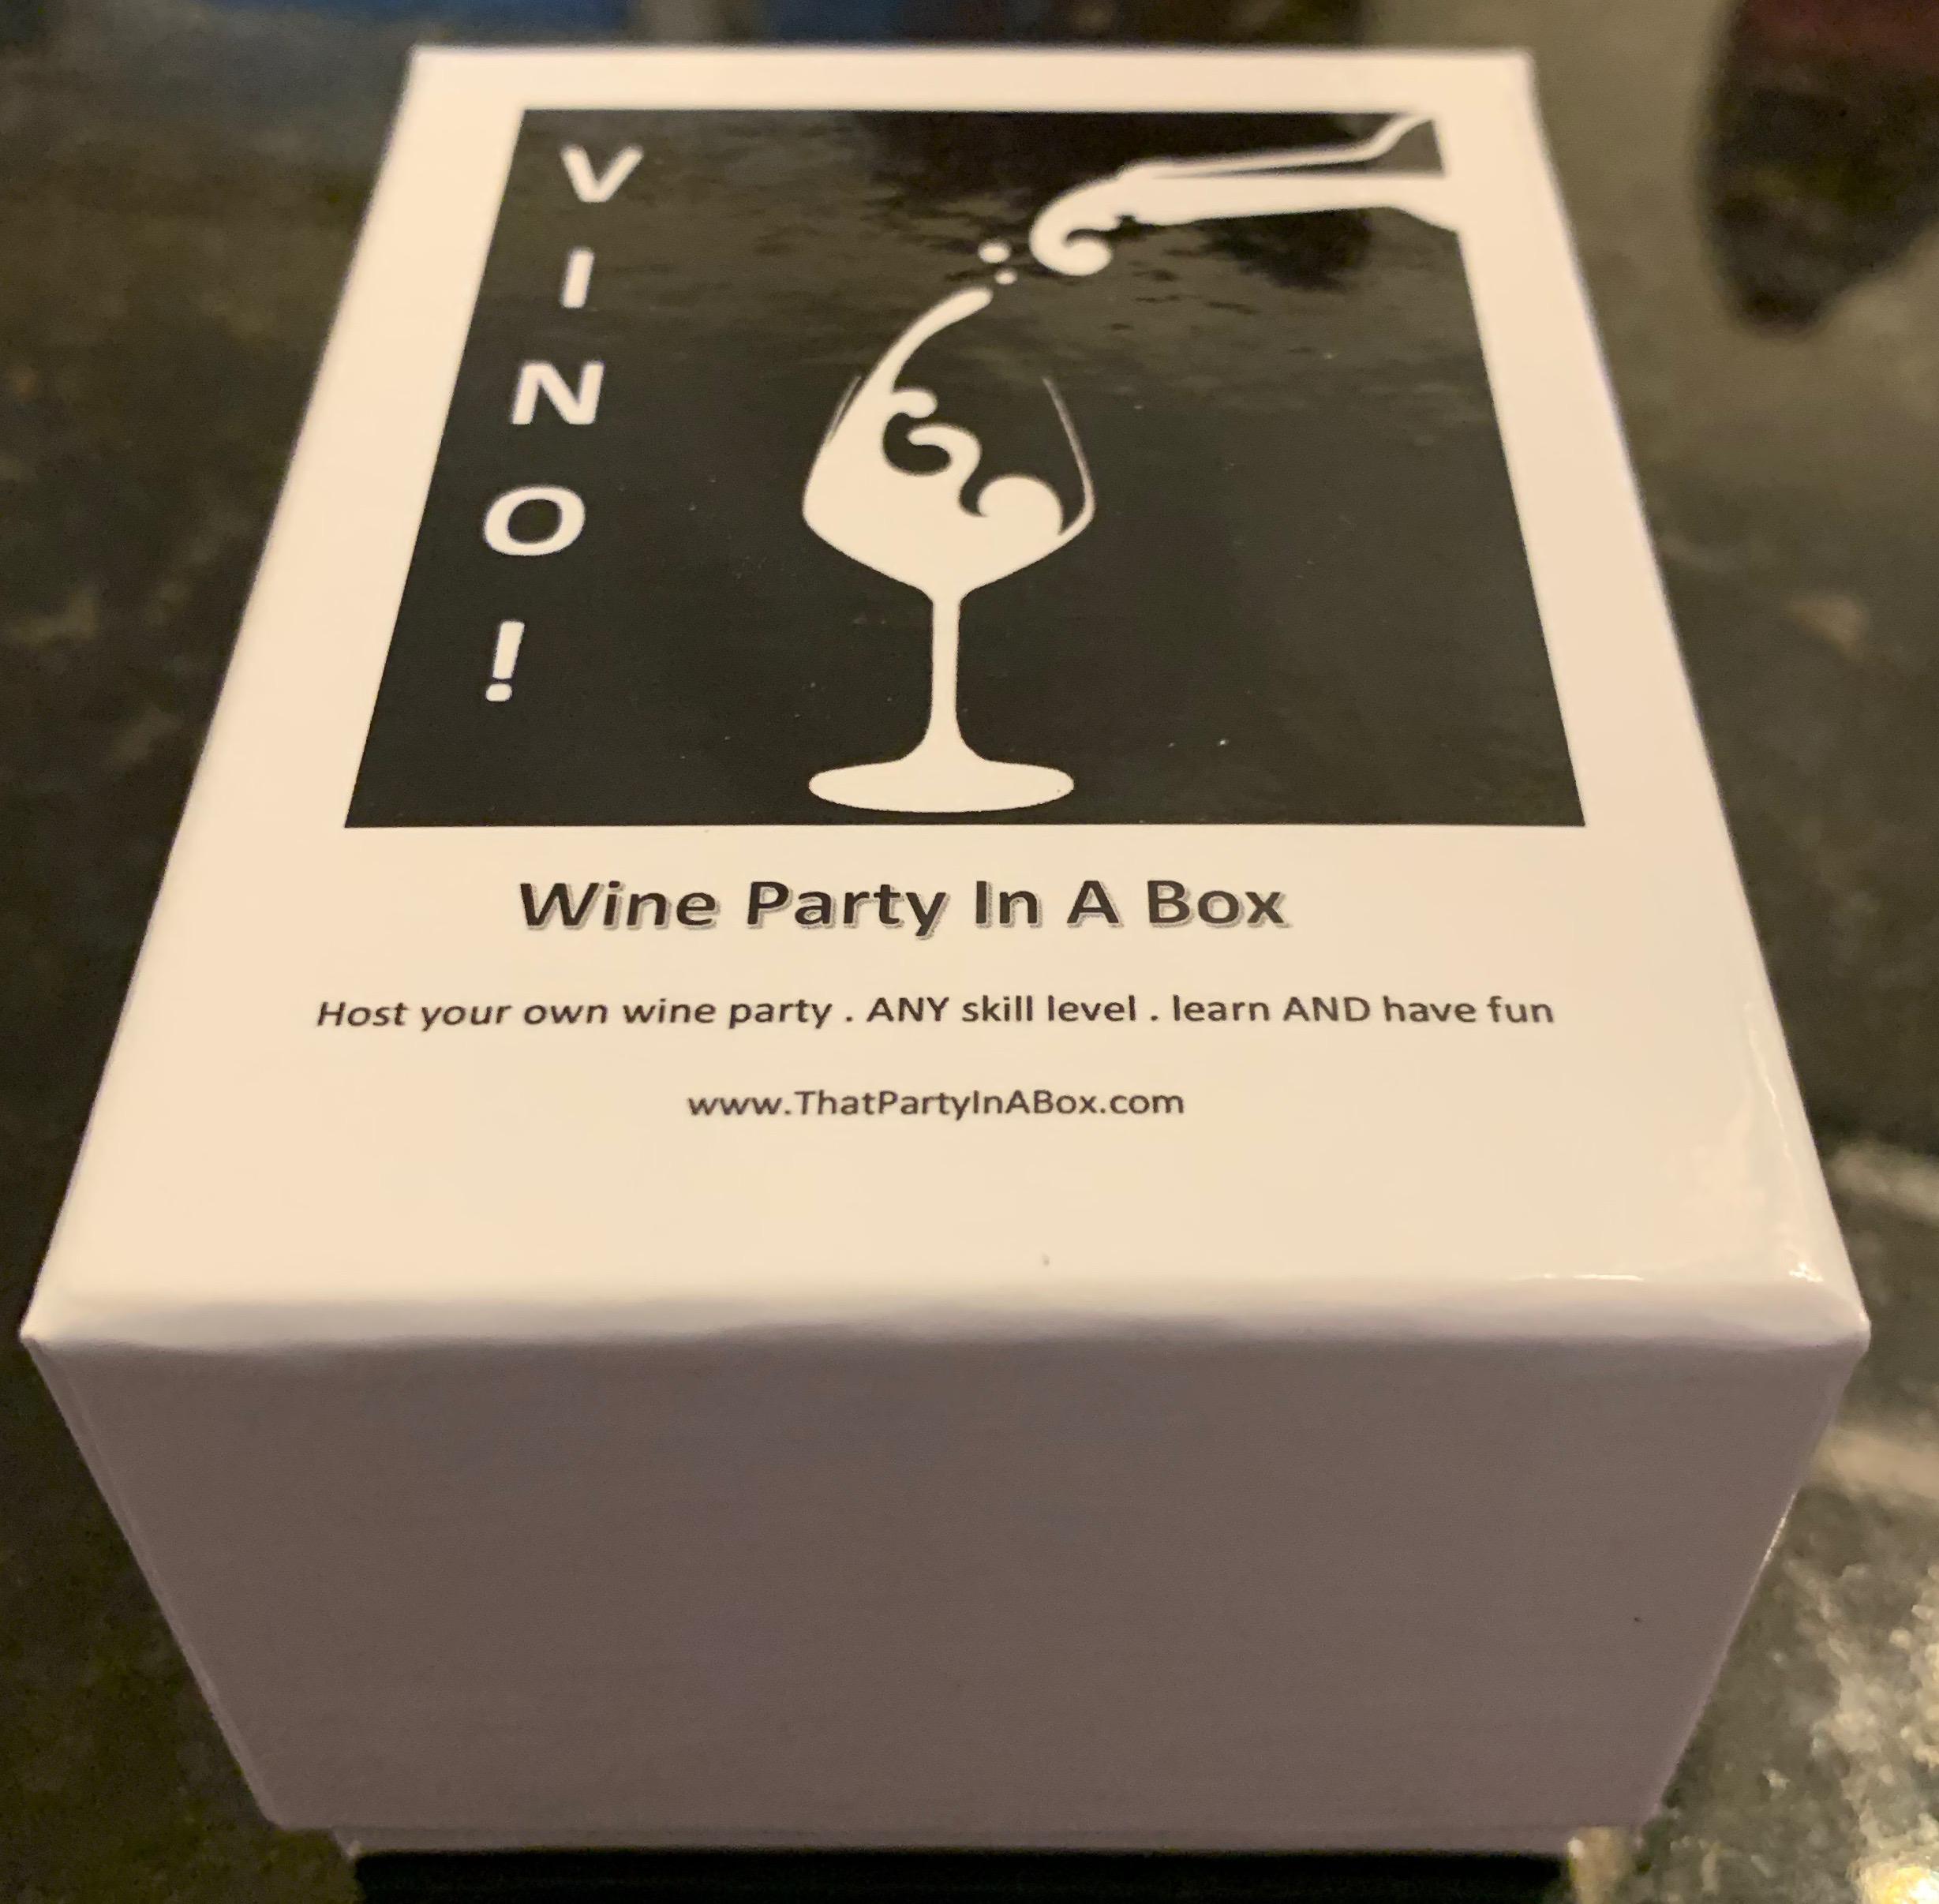 VINO! wine tasting party in a box